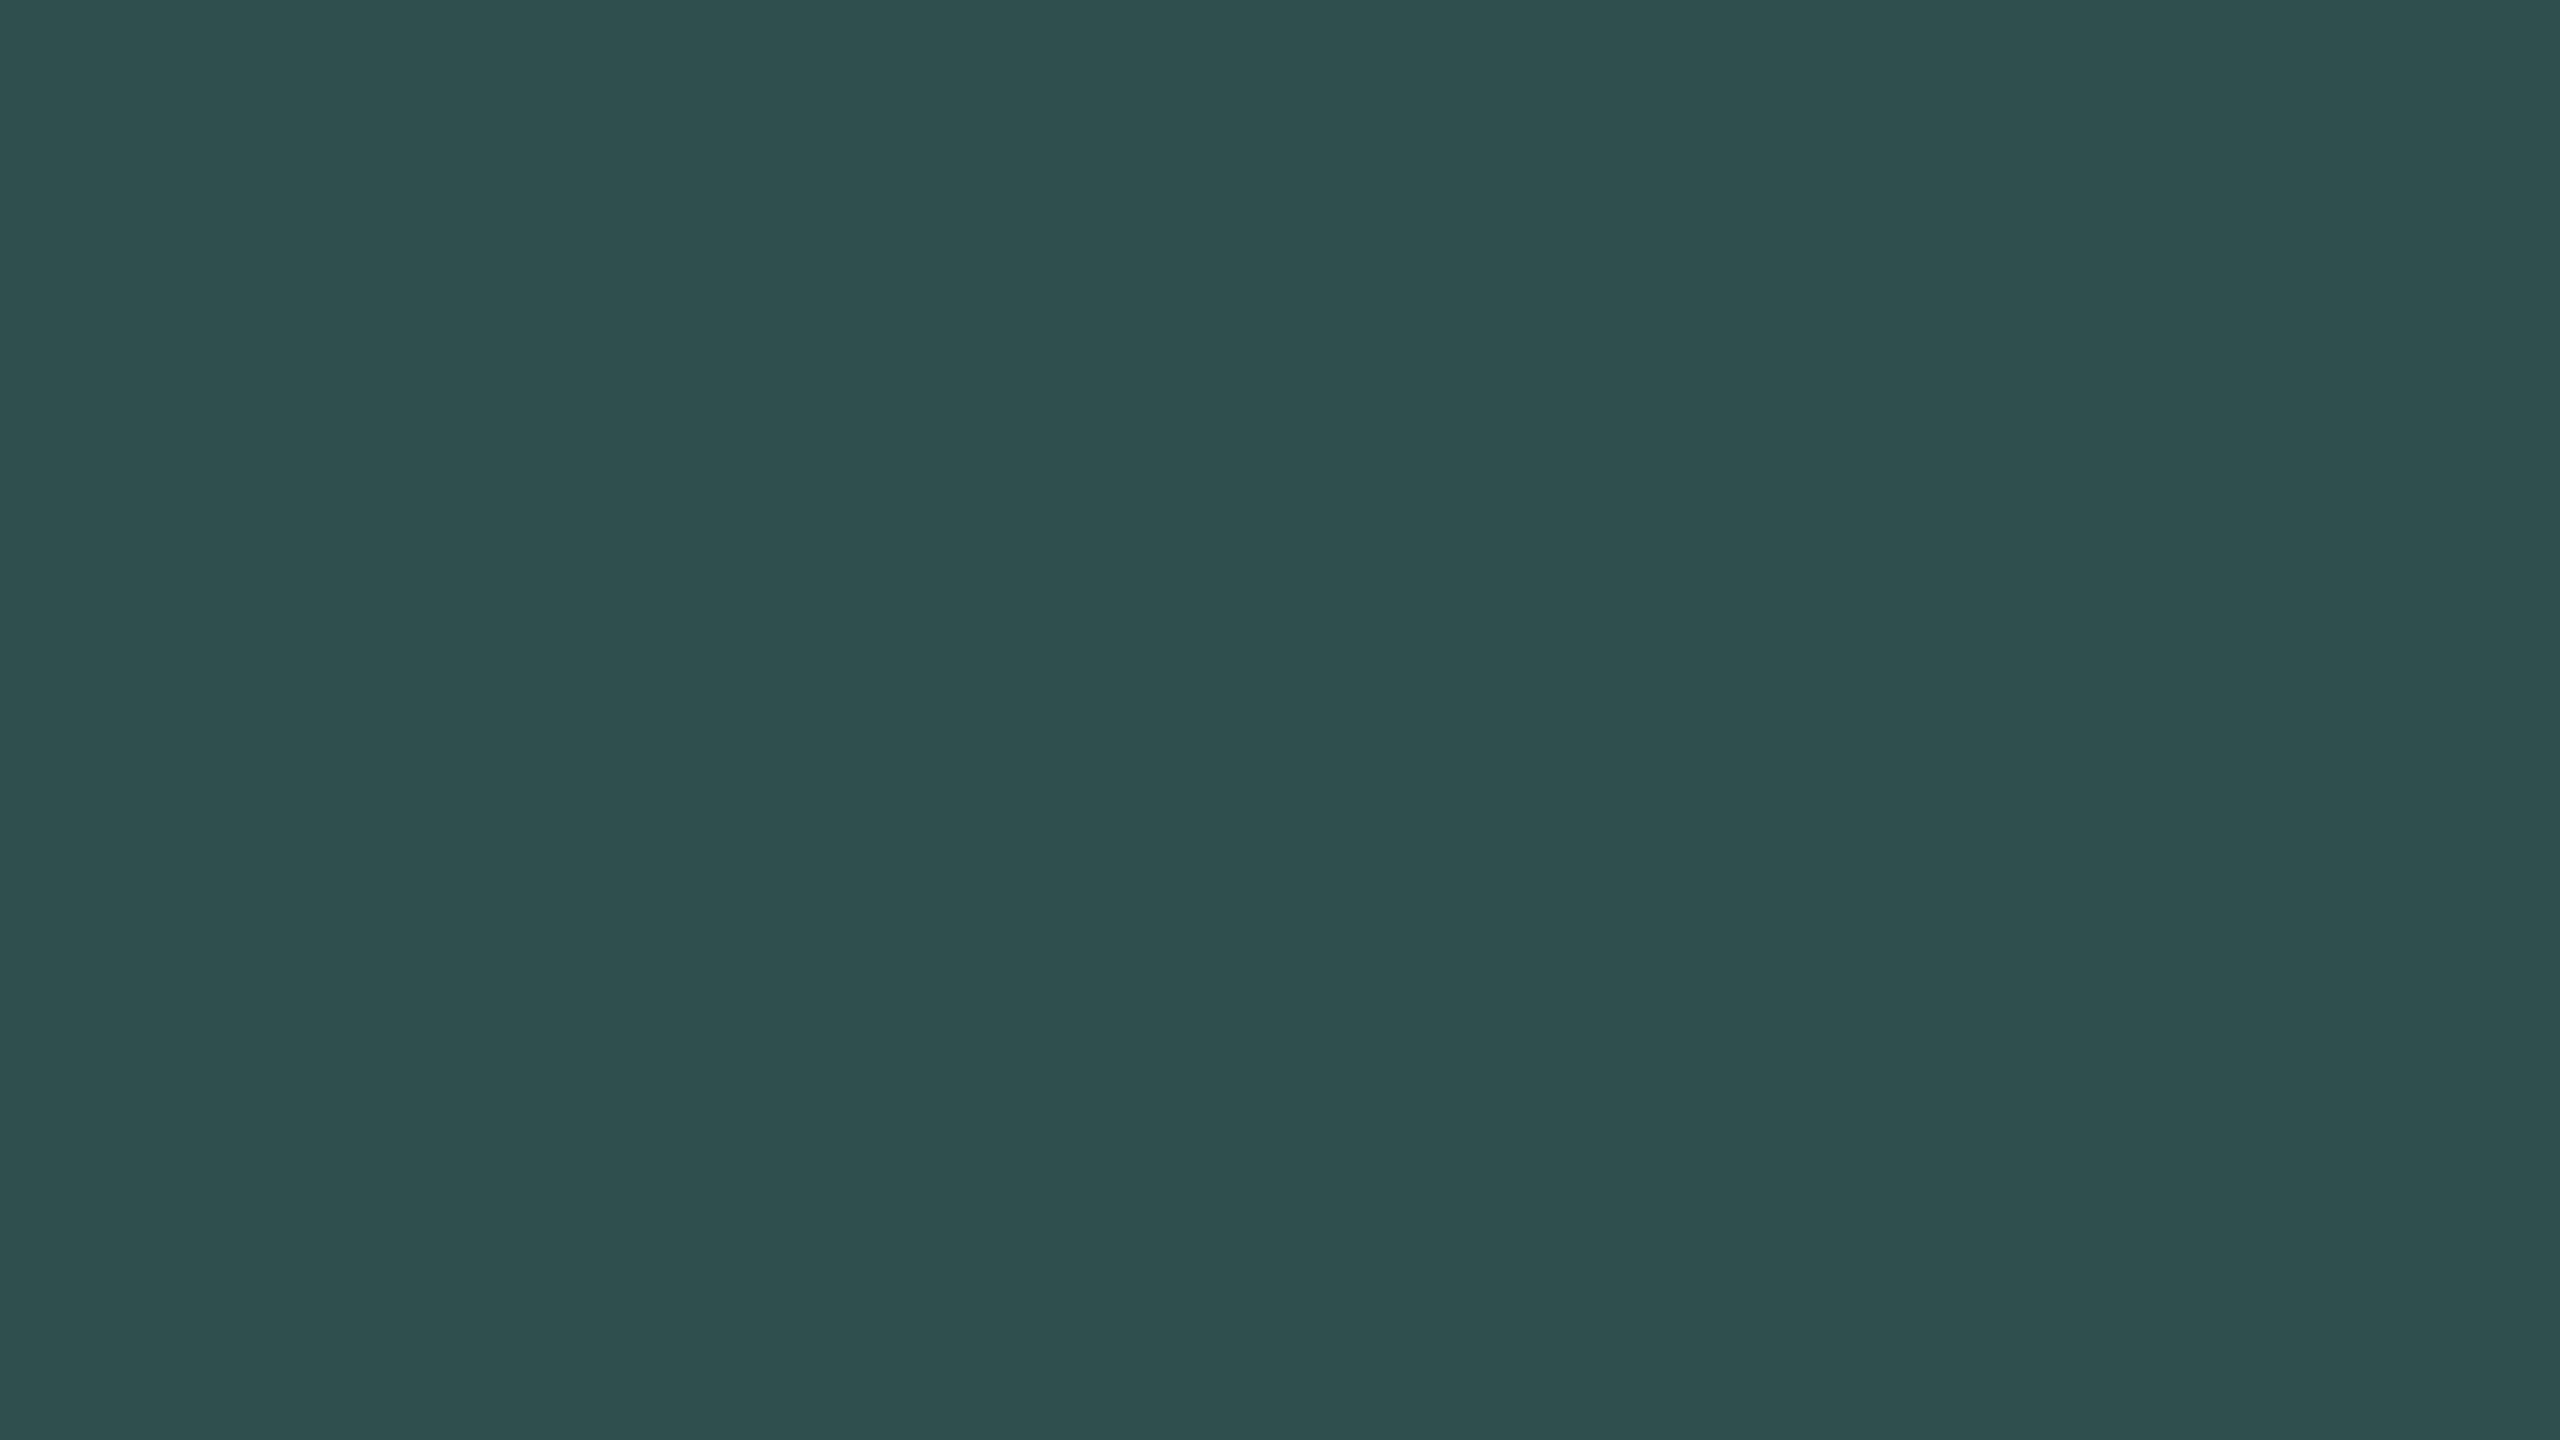 Dark Slate Color : Dark slate gray solid color background